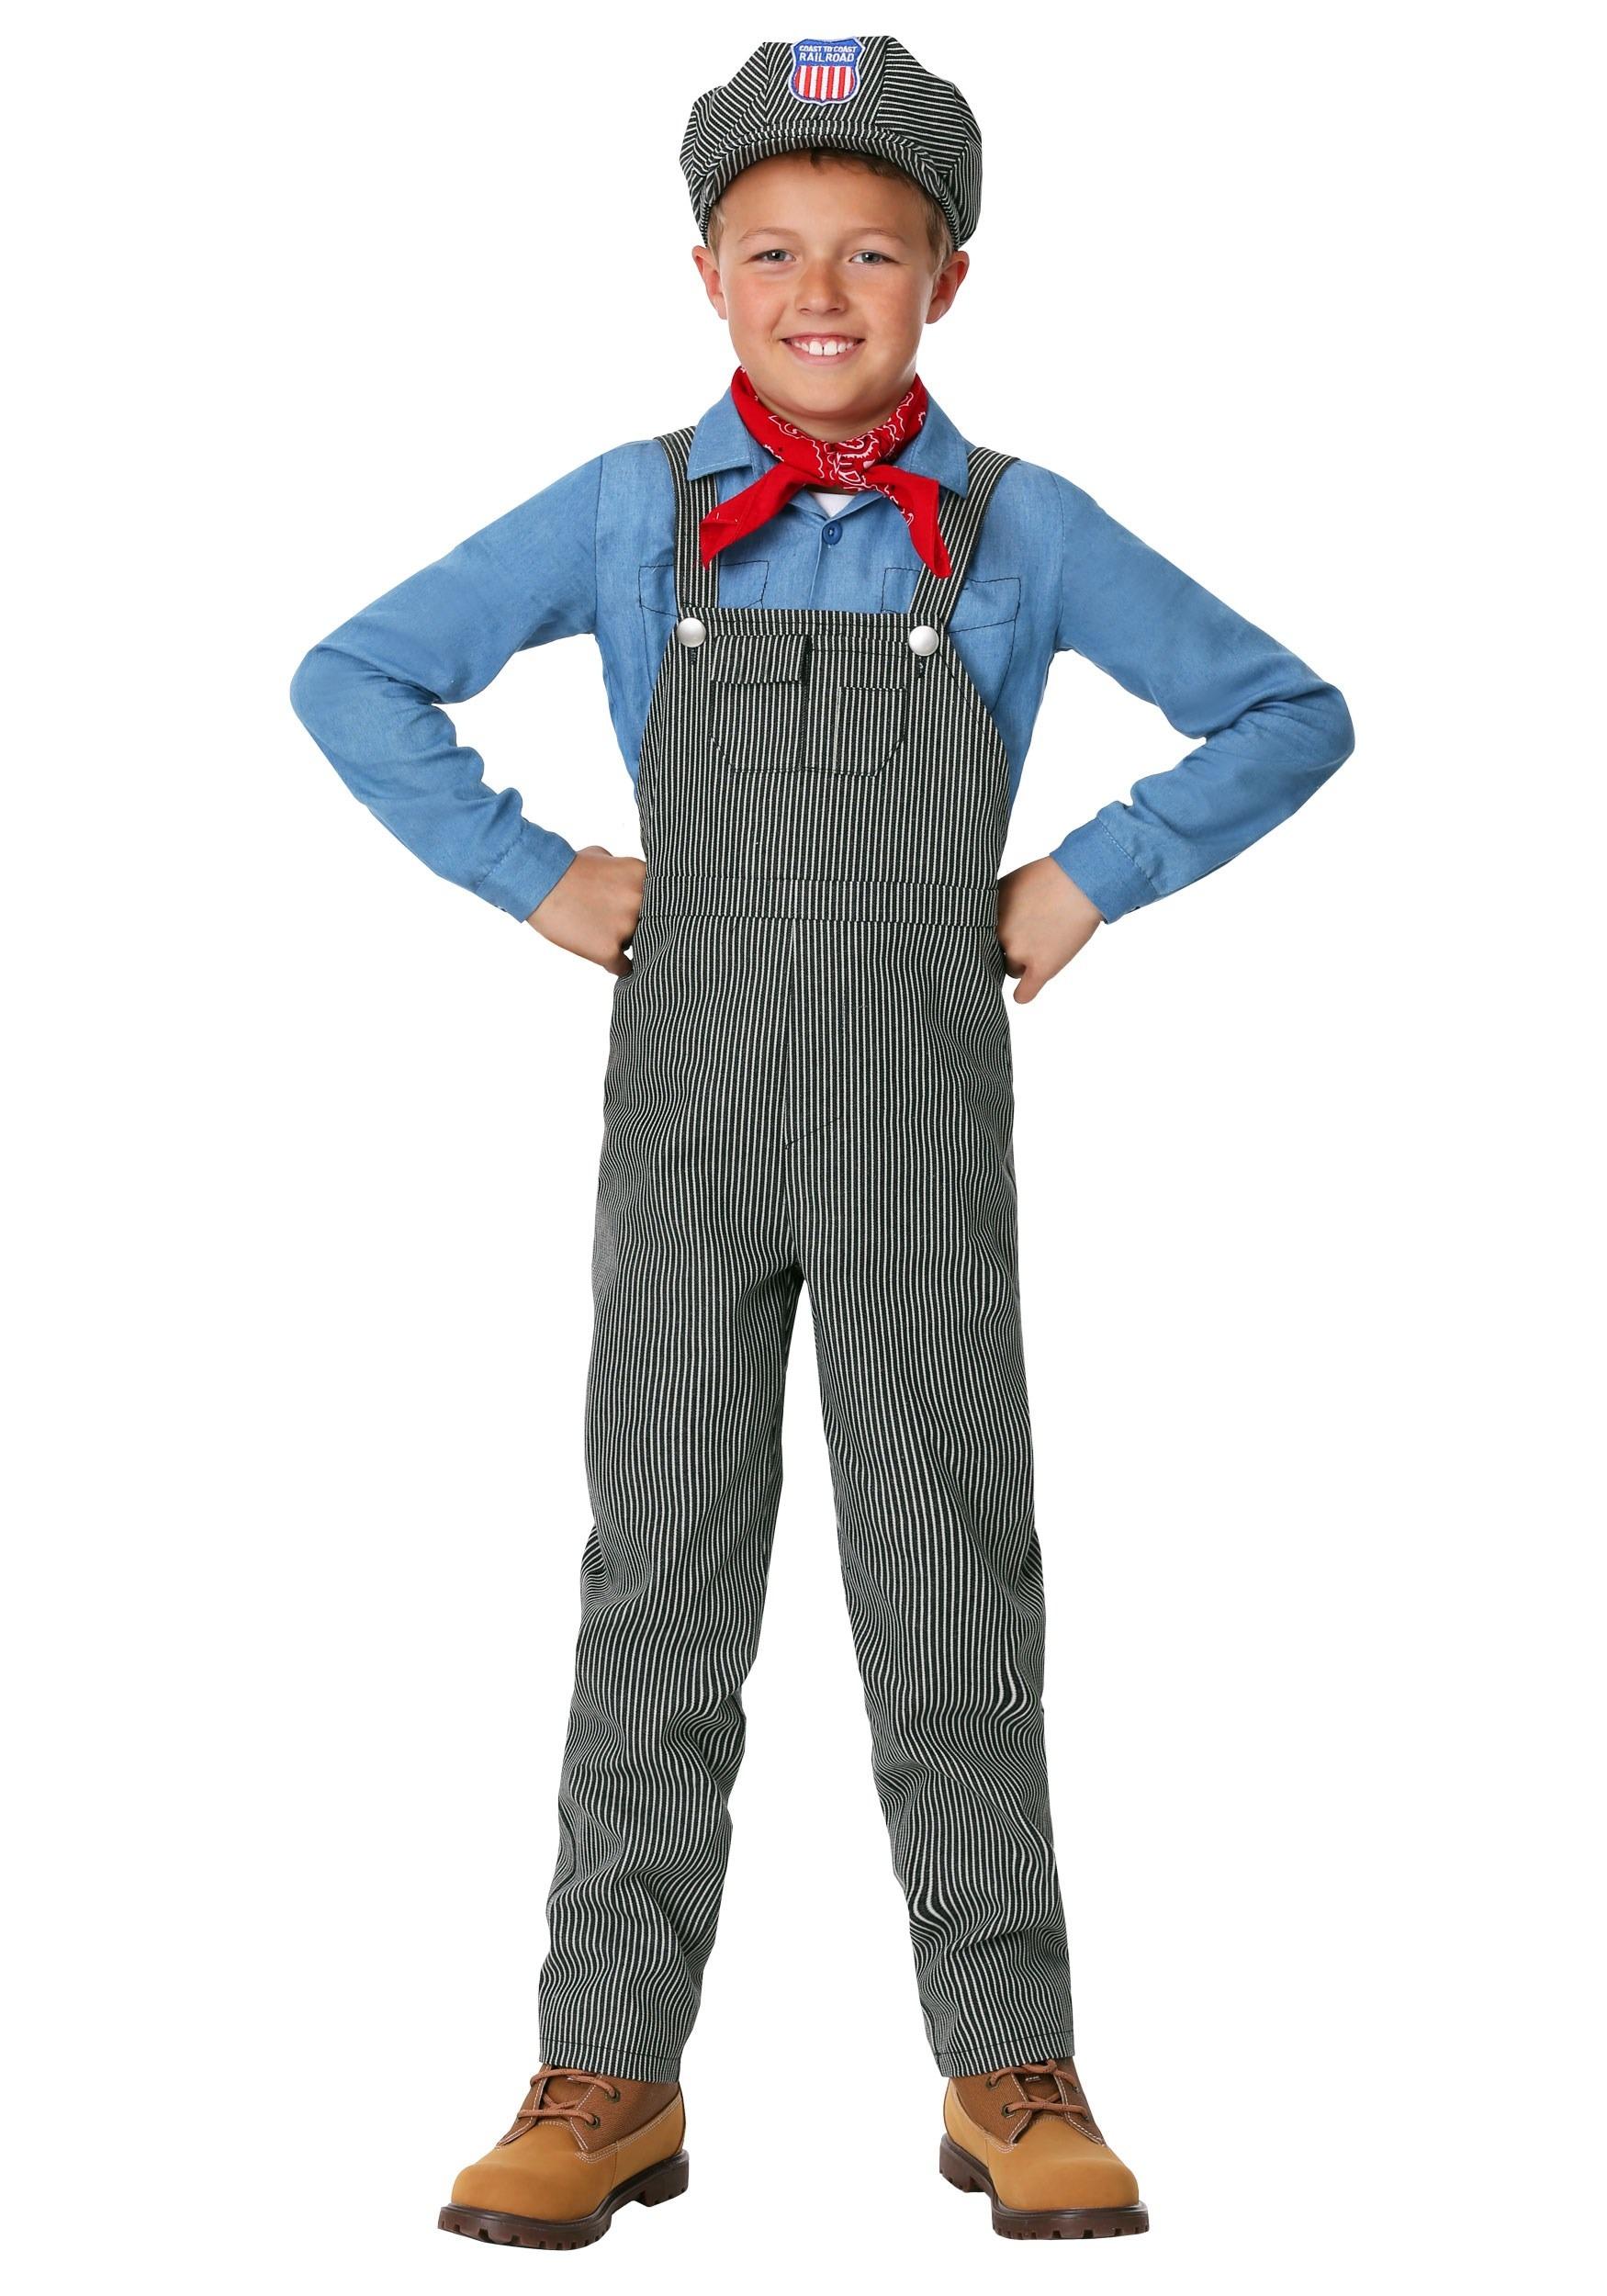 Train Engineer Costume for Children